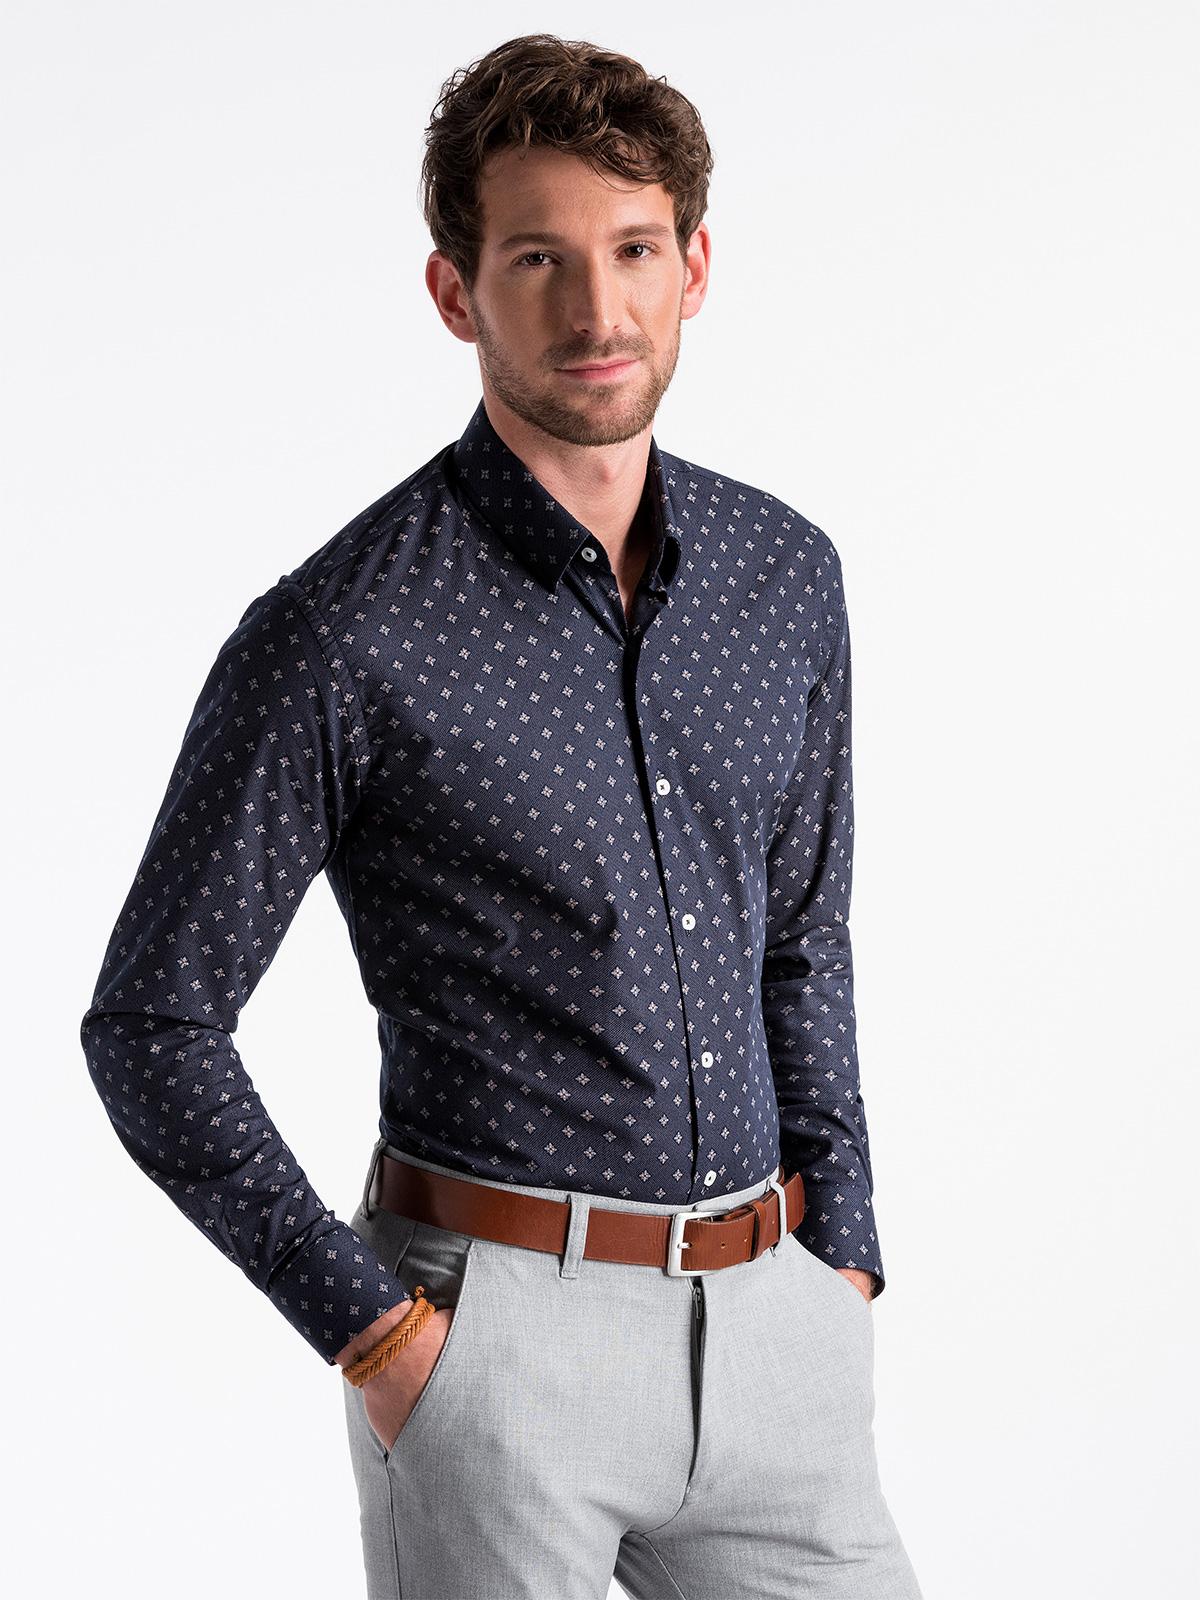 364aa99582e9db Koszula męska elegancka z długim rękawem K494 - ciemnogranatowa ...